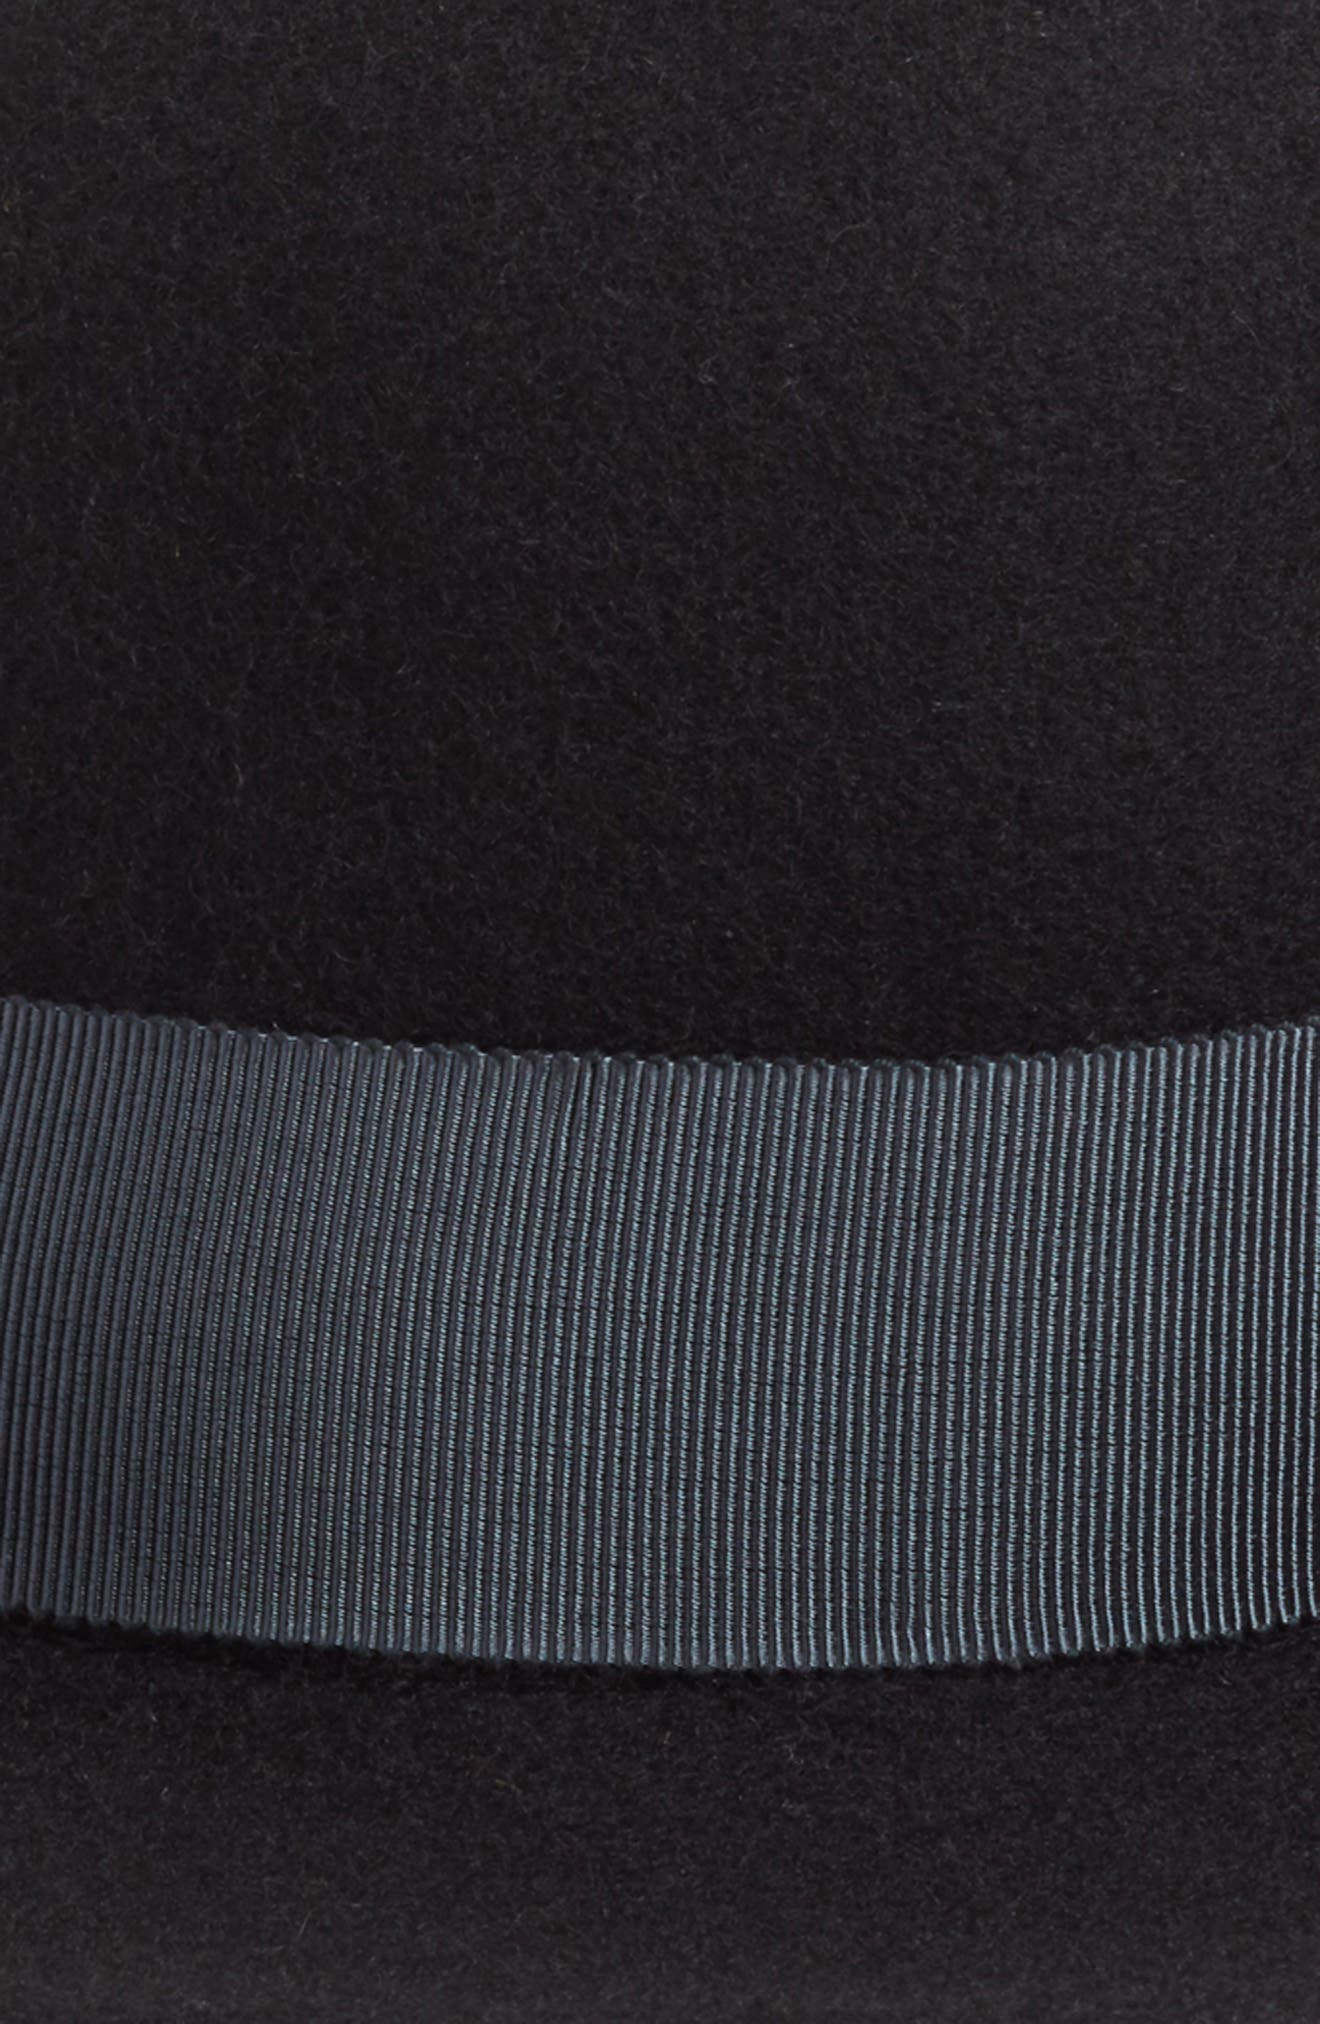 Wool Felt Round Hat,                             Alternate thumbnail 2, color,                             008